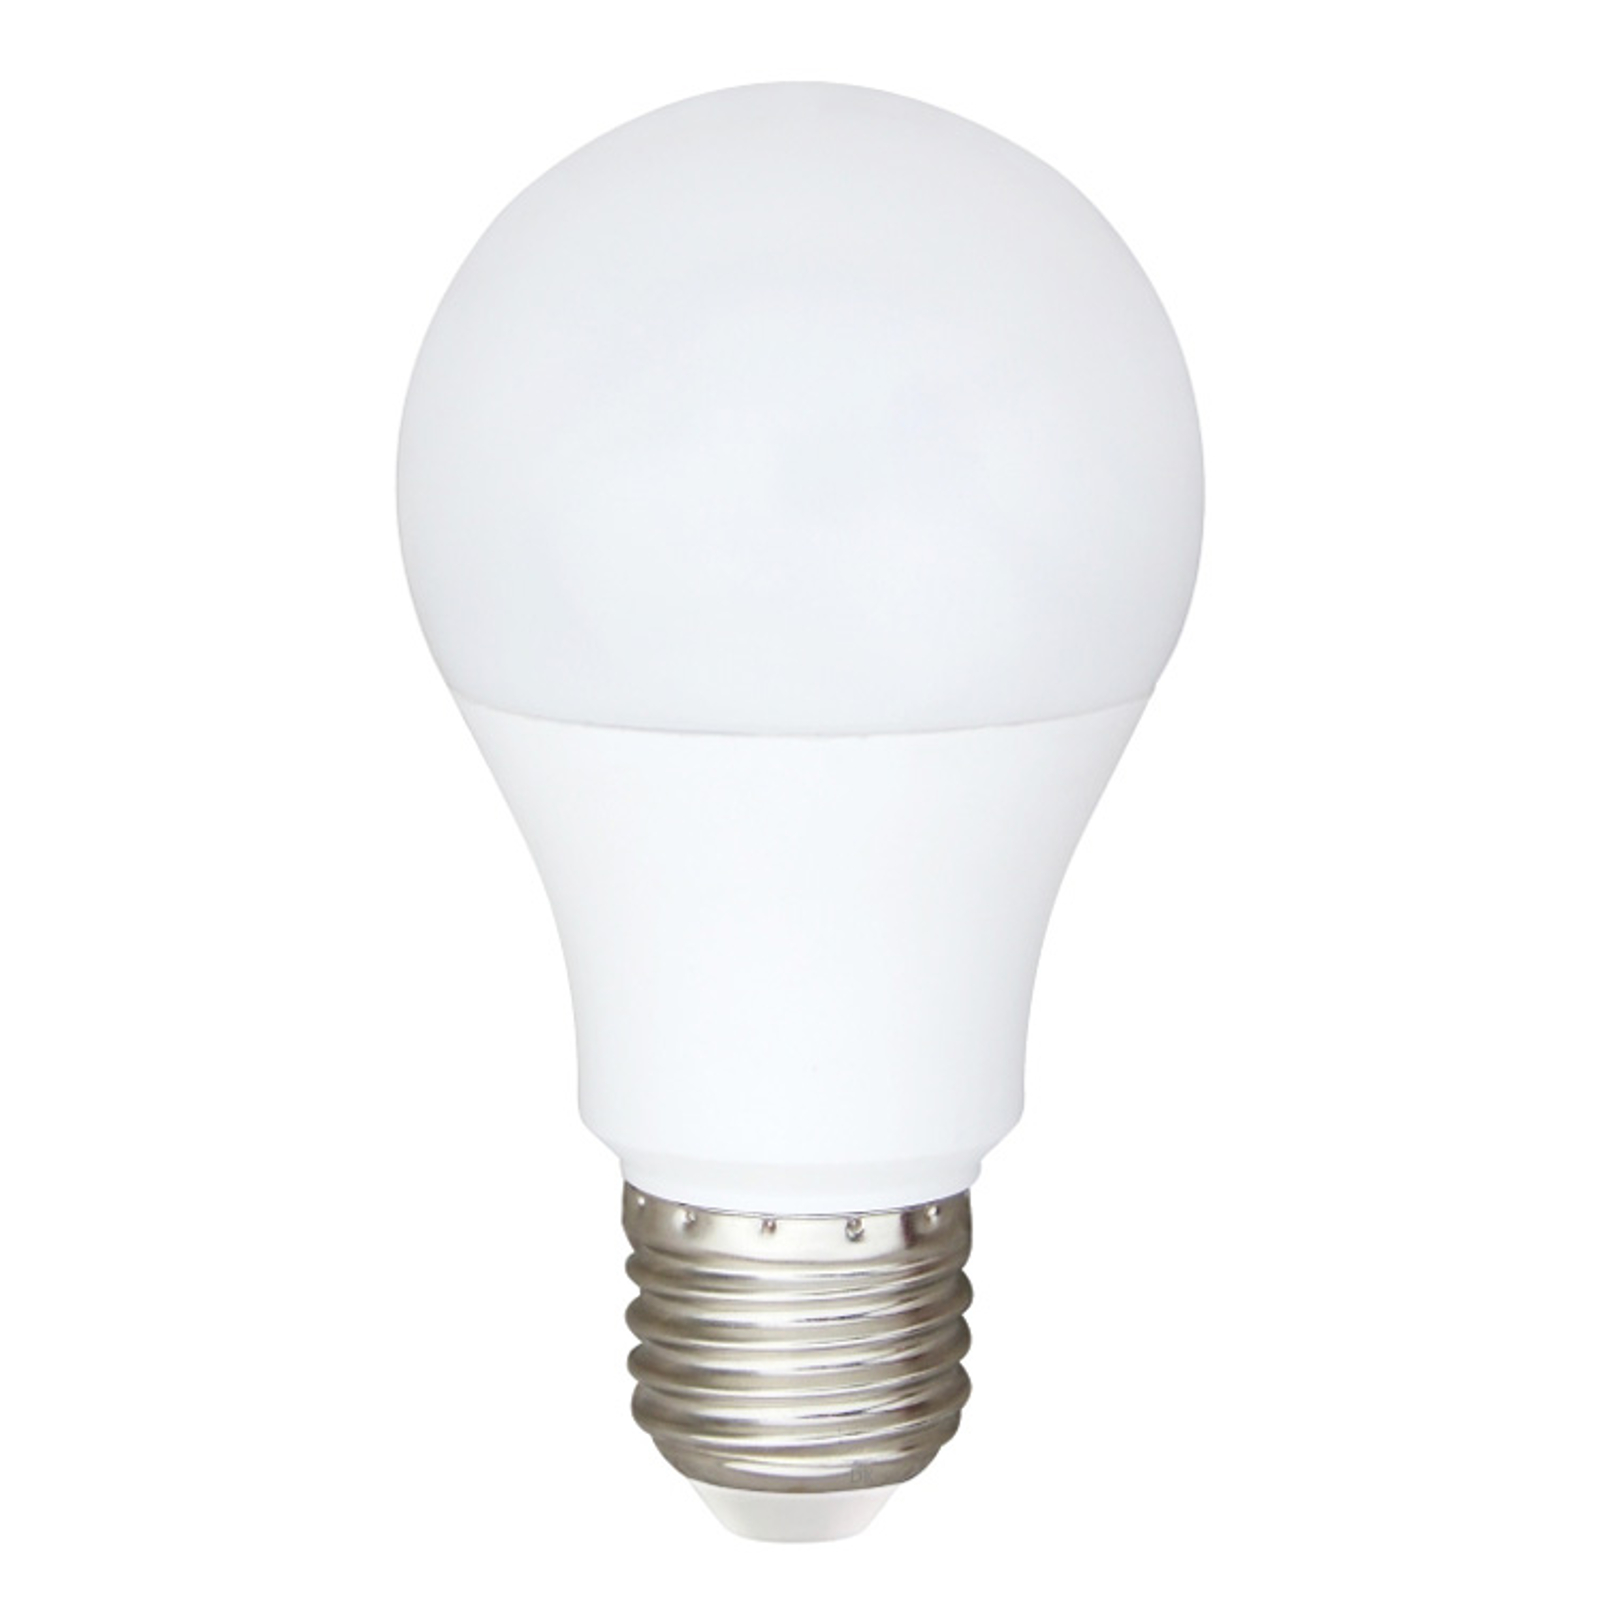 Żarówka LED ARAXA E27 9W 2700K Ra90